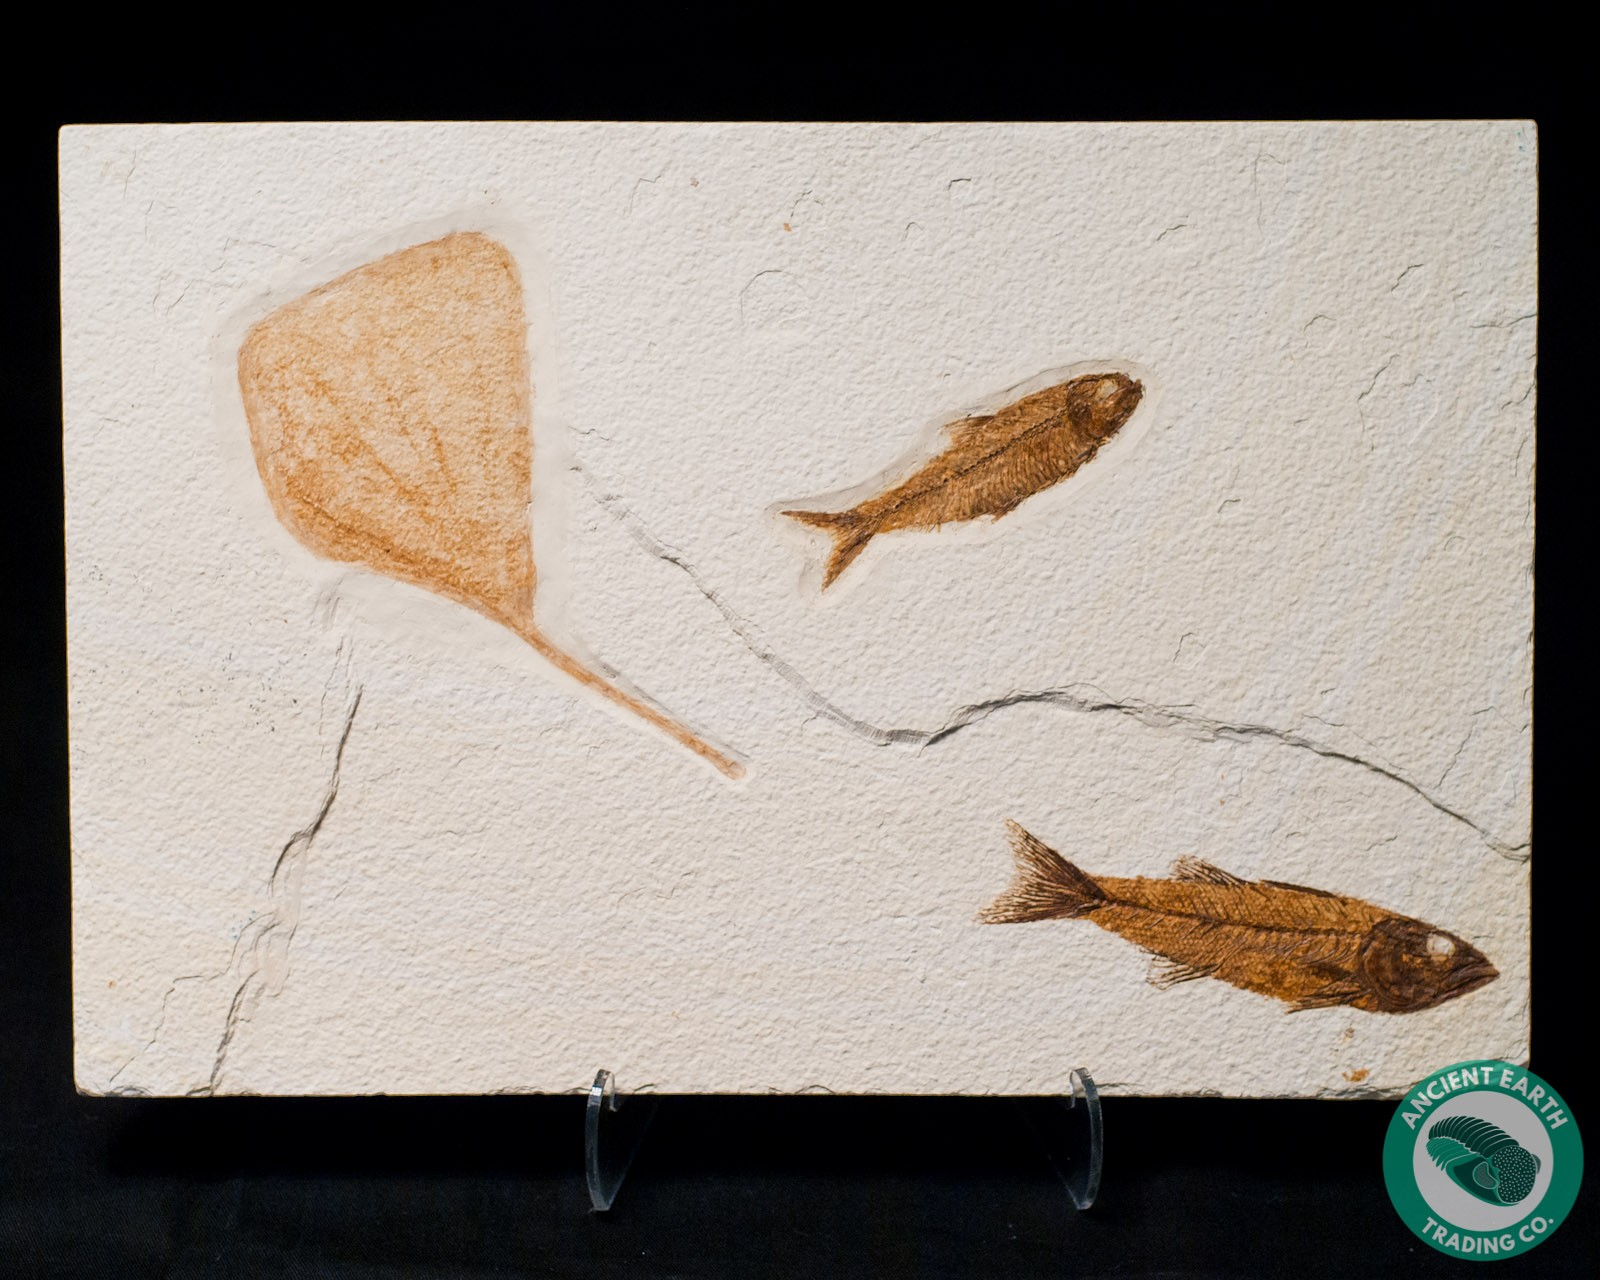 A+ Mioplosus with Knightia + Poplar Leaf - 14.4 x 9.5 in.